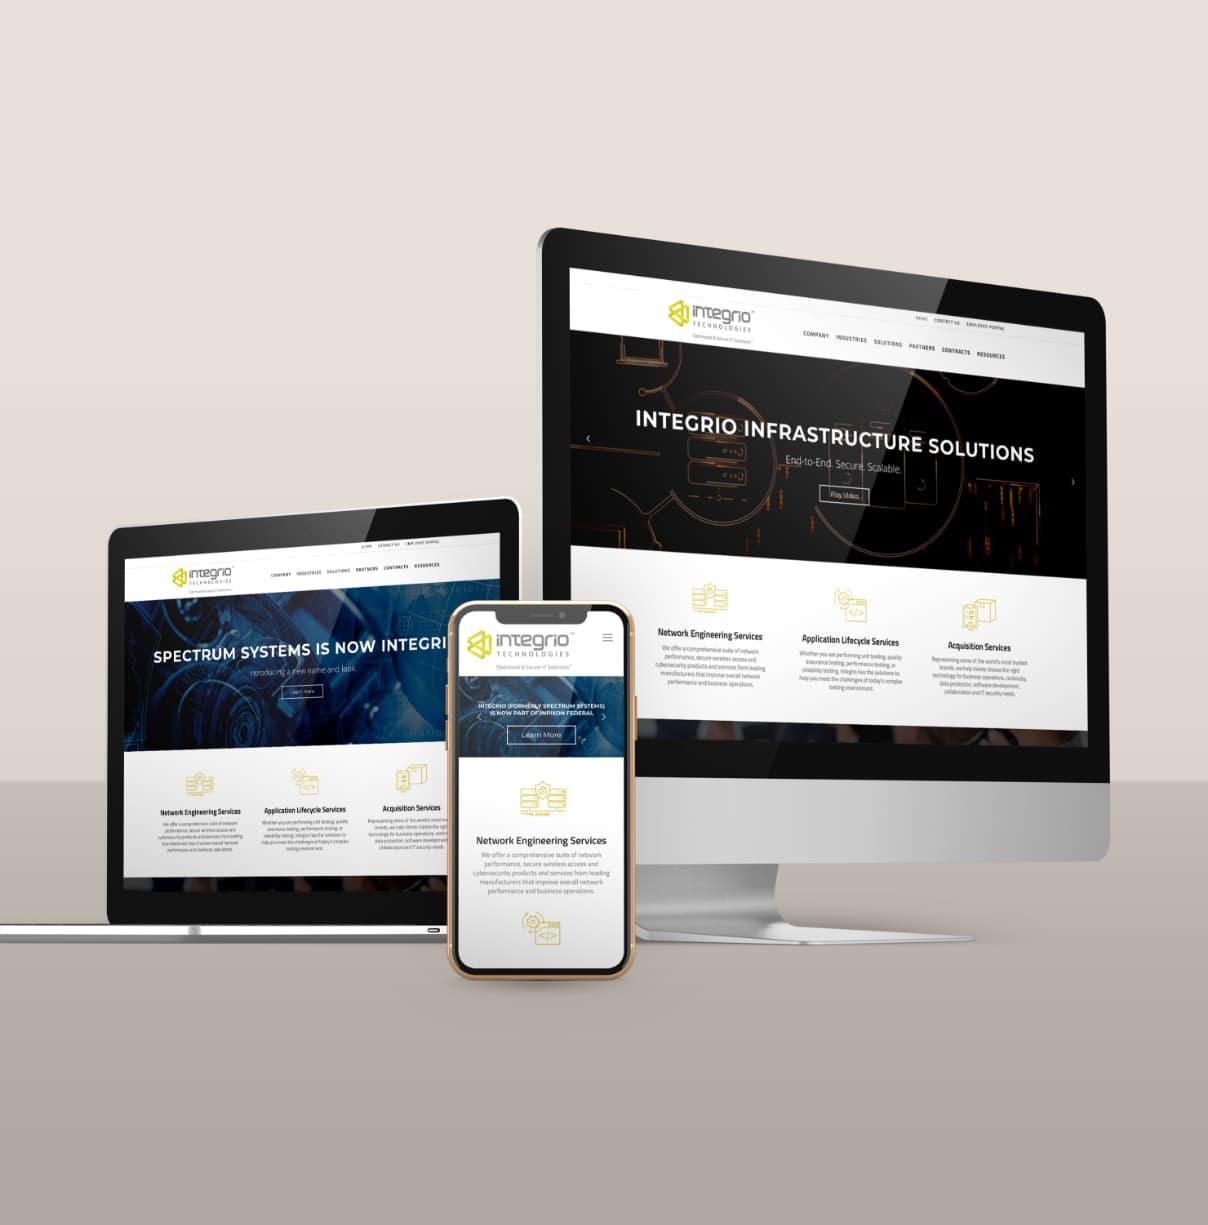 Integrio Technologies website design and development using WordPress